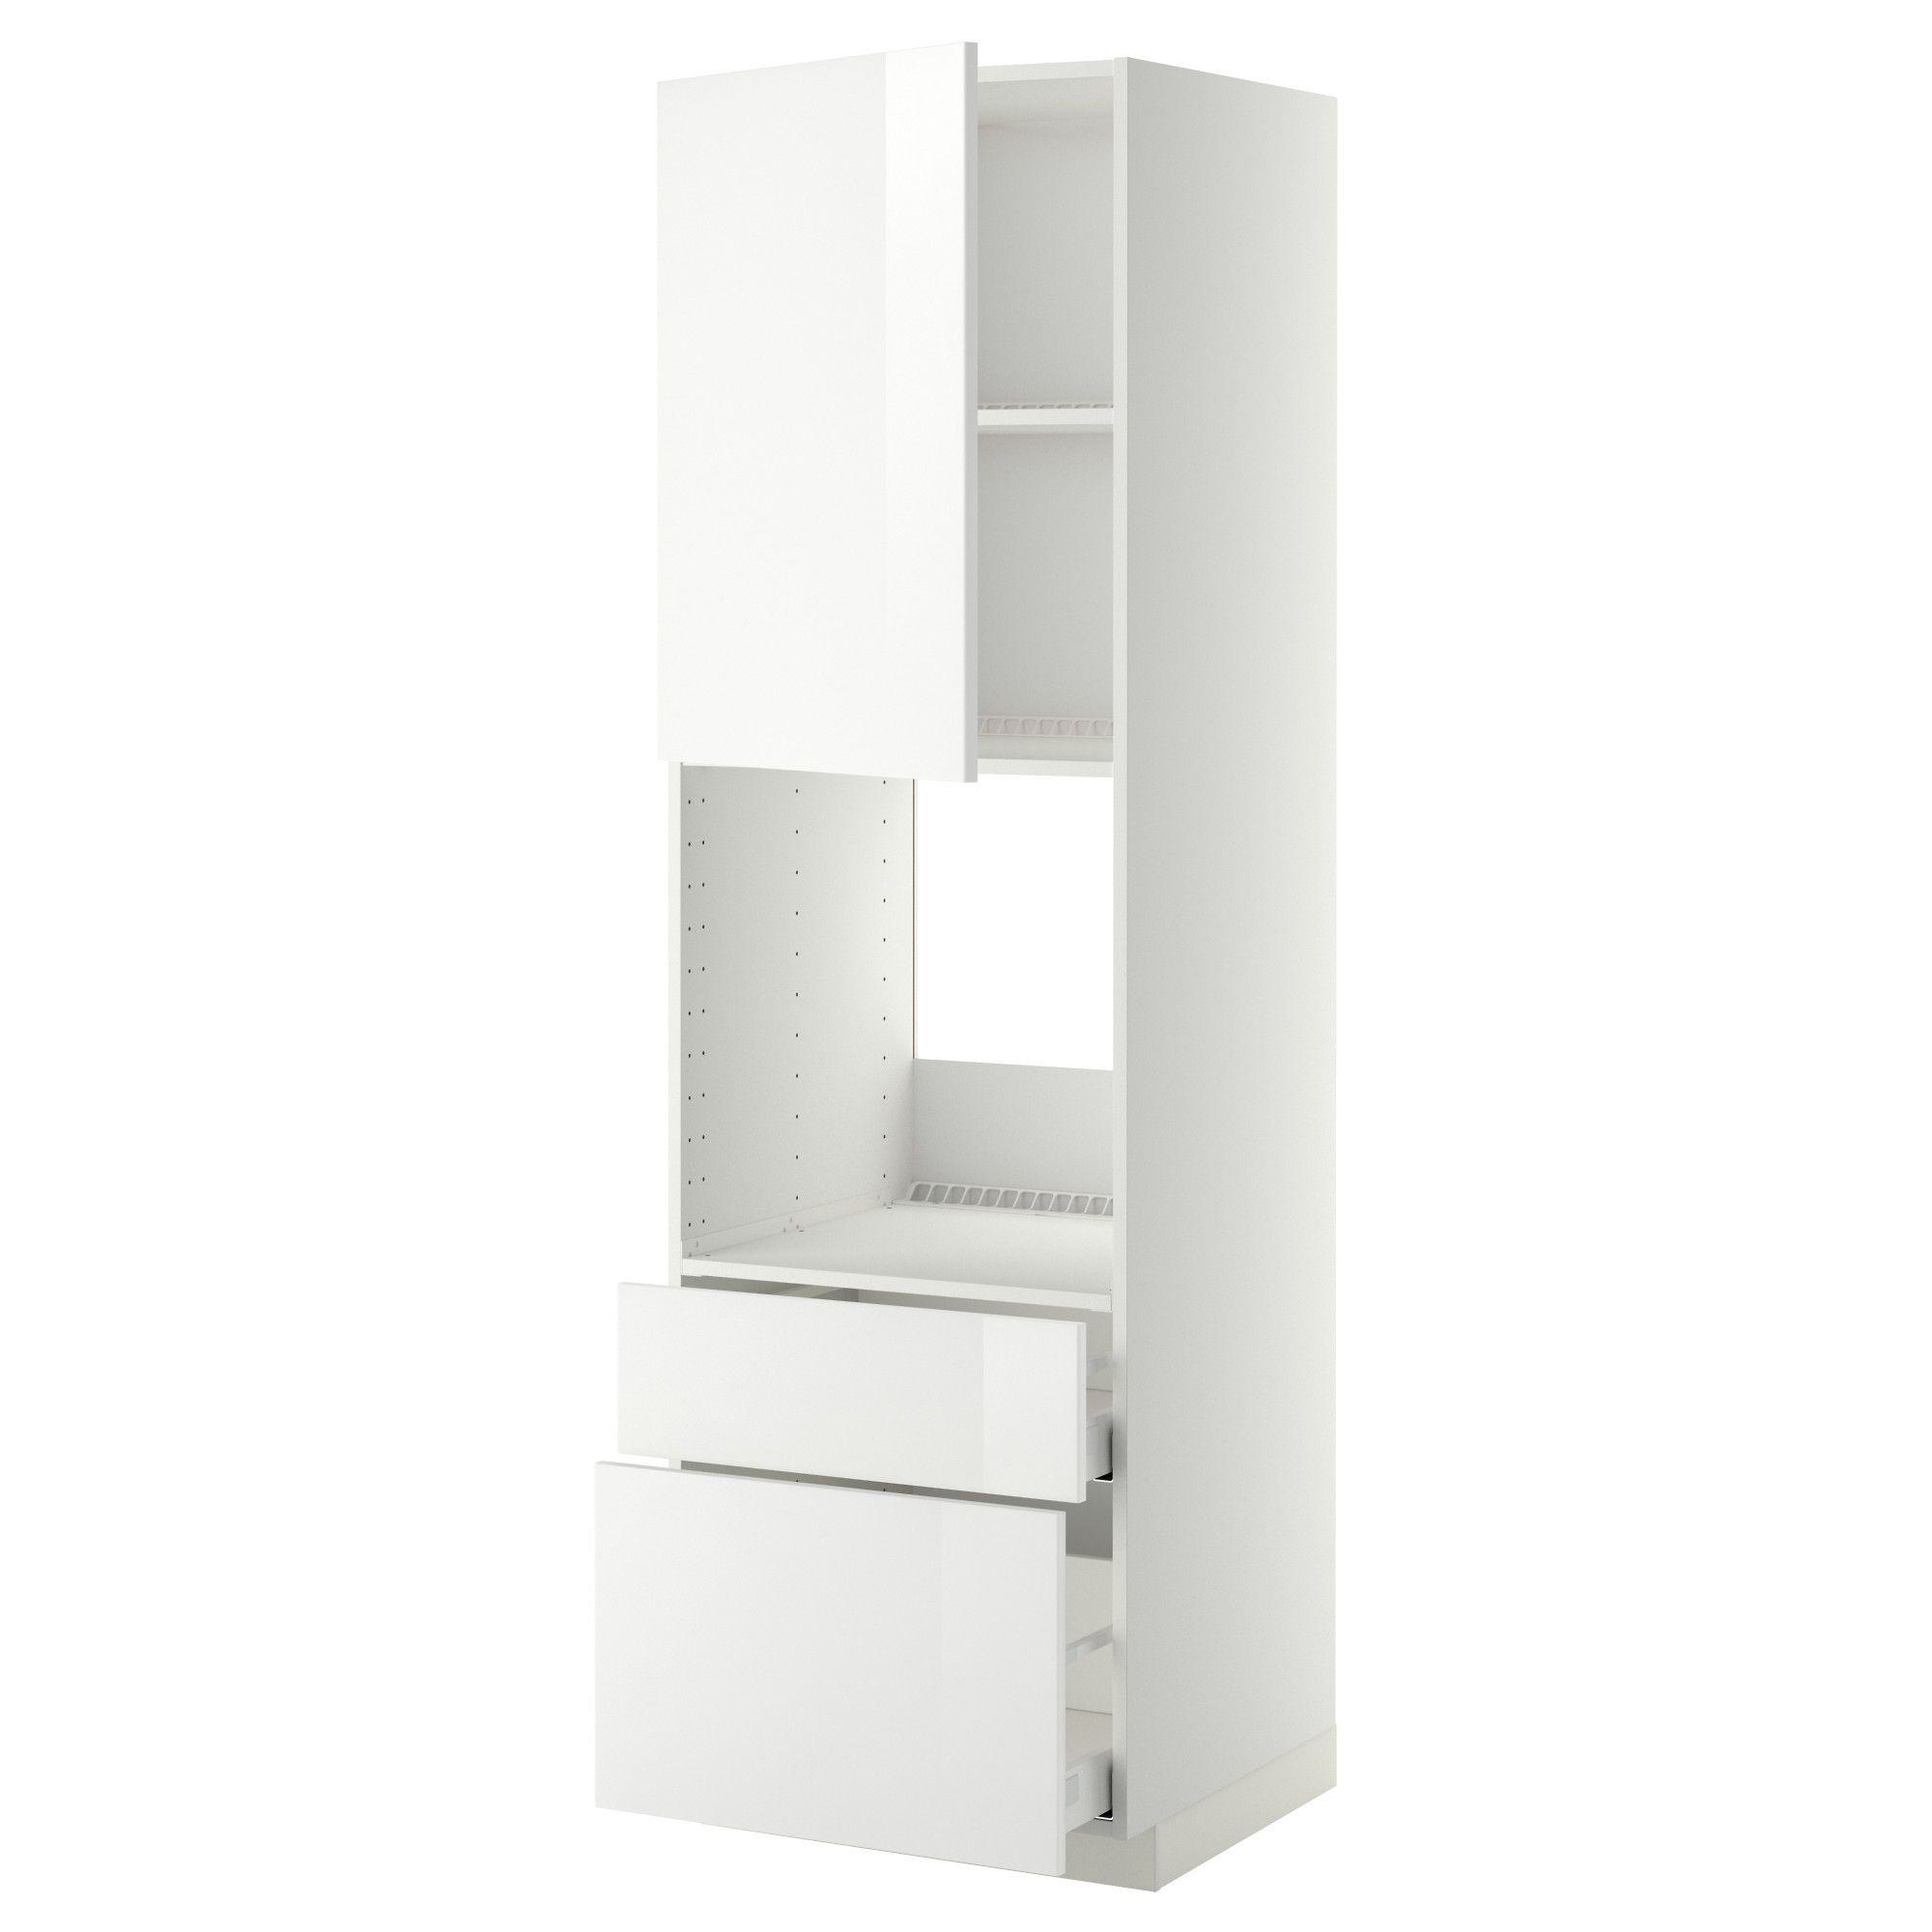 METOD/MAXIMERA Høyskap f ovn skuff/2 fr/1 m/h sk - hvit, Veddinge hvit, 60x60x200 cm - IKEA